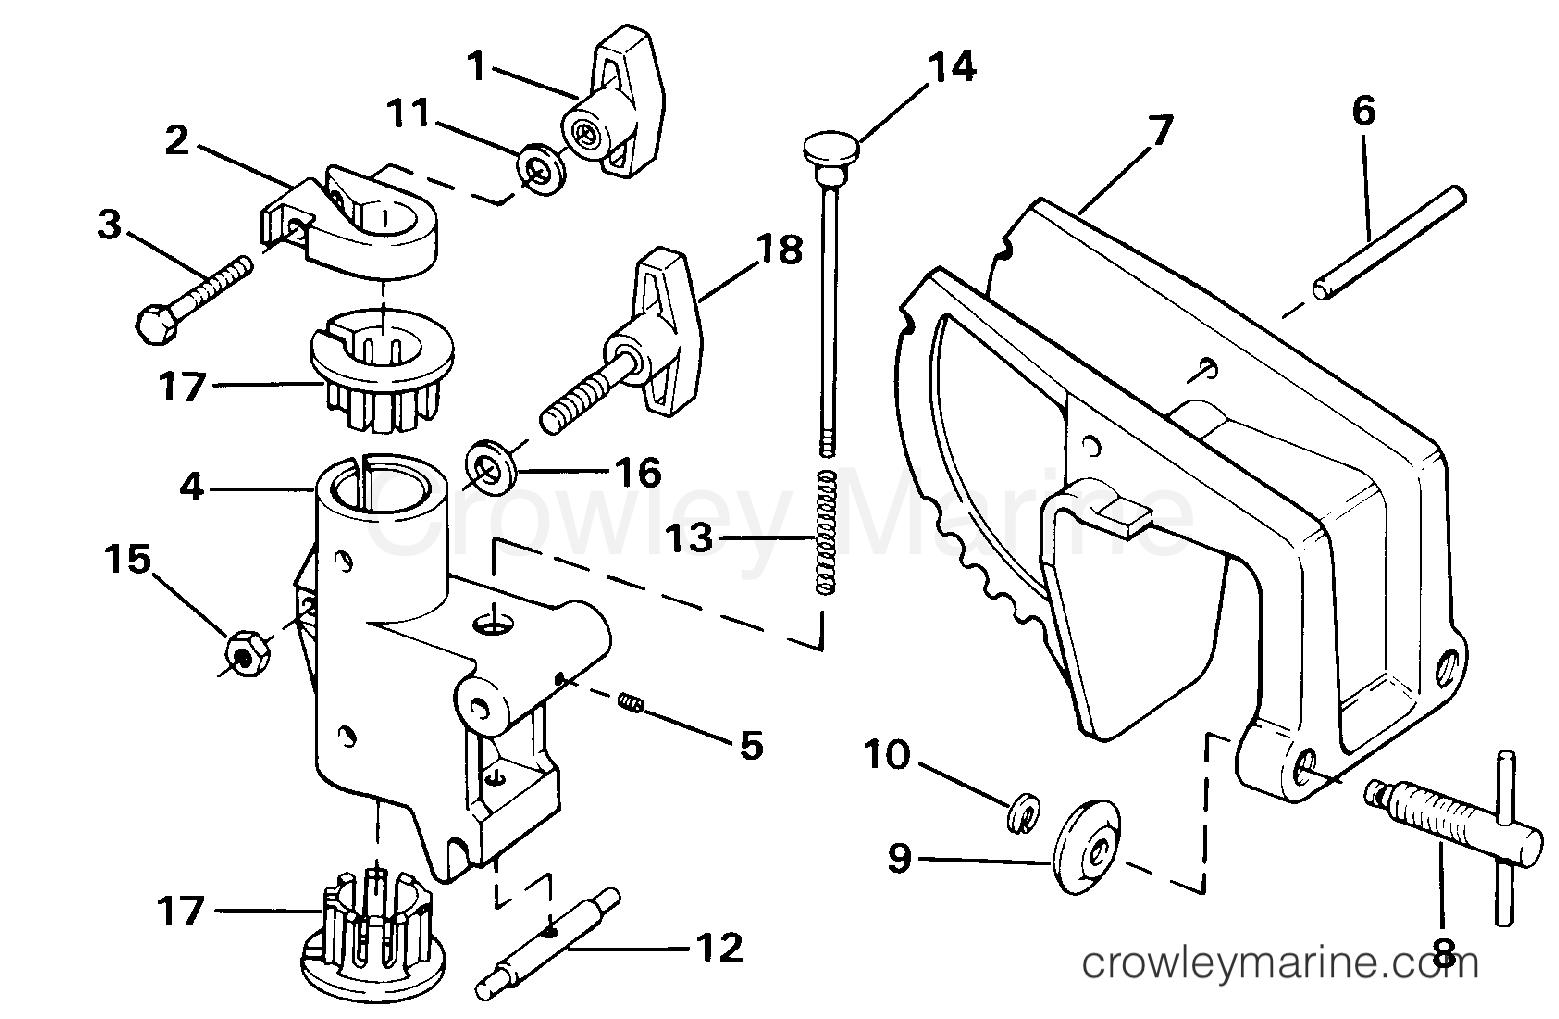 1990 Electric Motors 24 Volt - BHL4K - TRANSOM MOUNT BRACKET